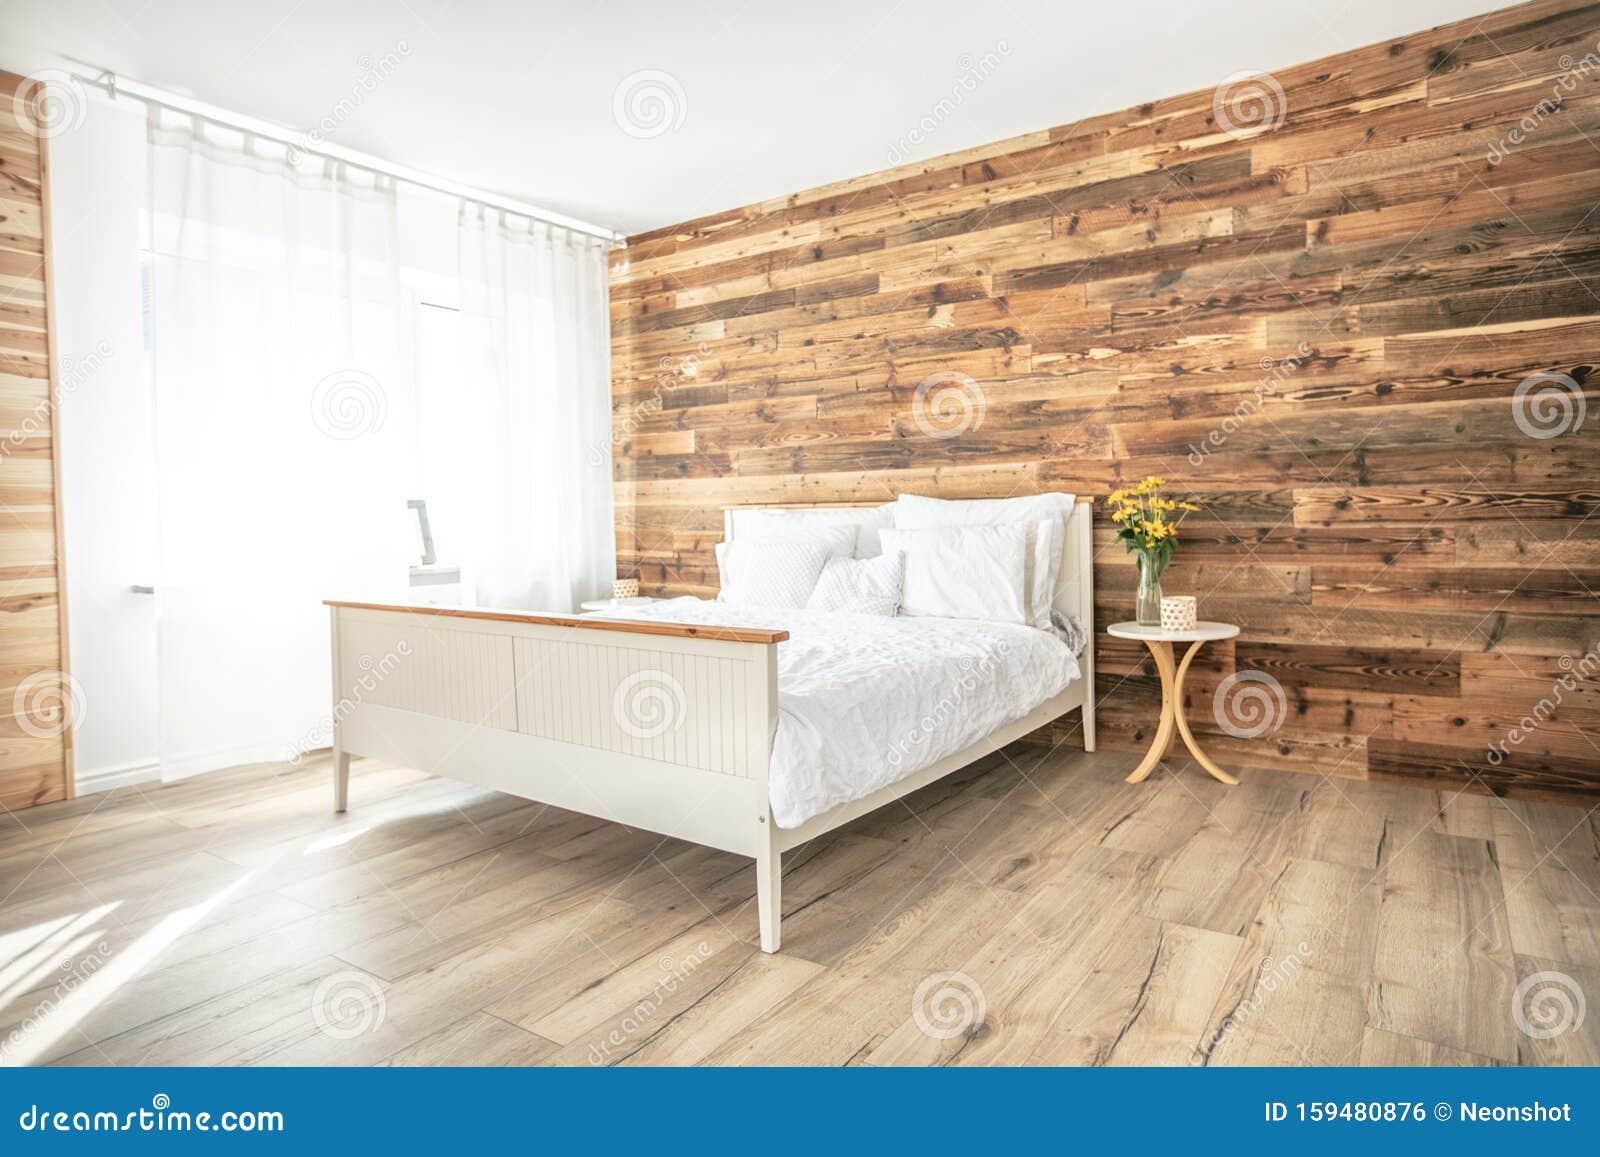 Nice Boho Interior Style Bedroom Stock Photo Image Of Comfortable Bohemian 159480876